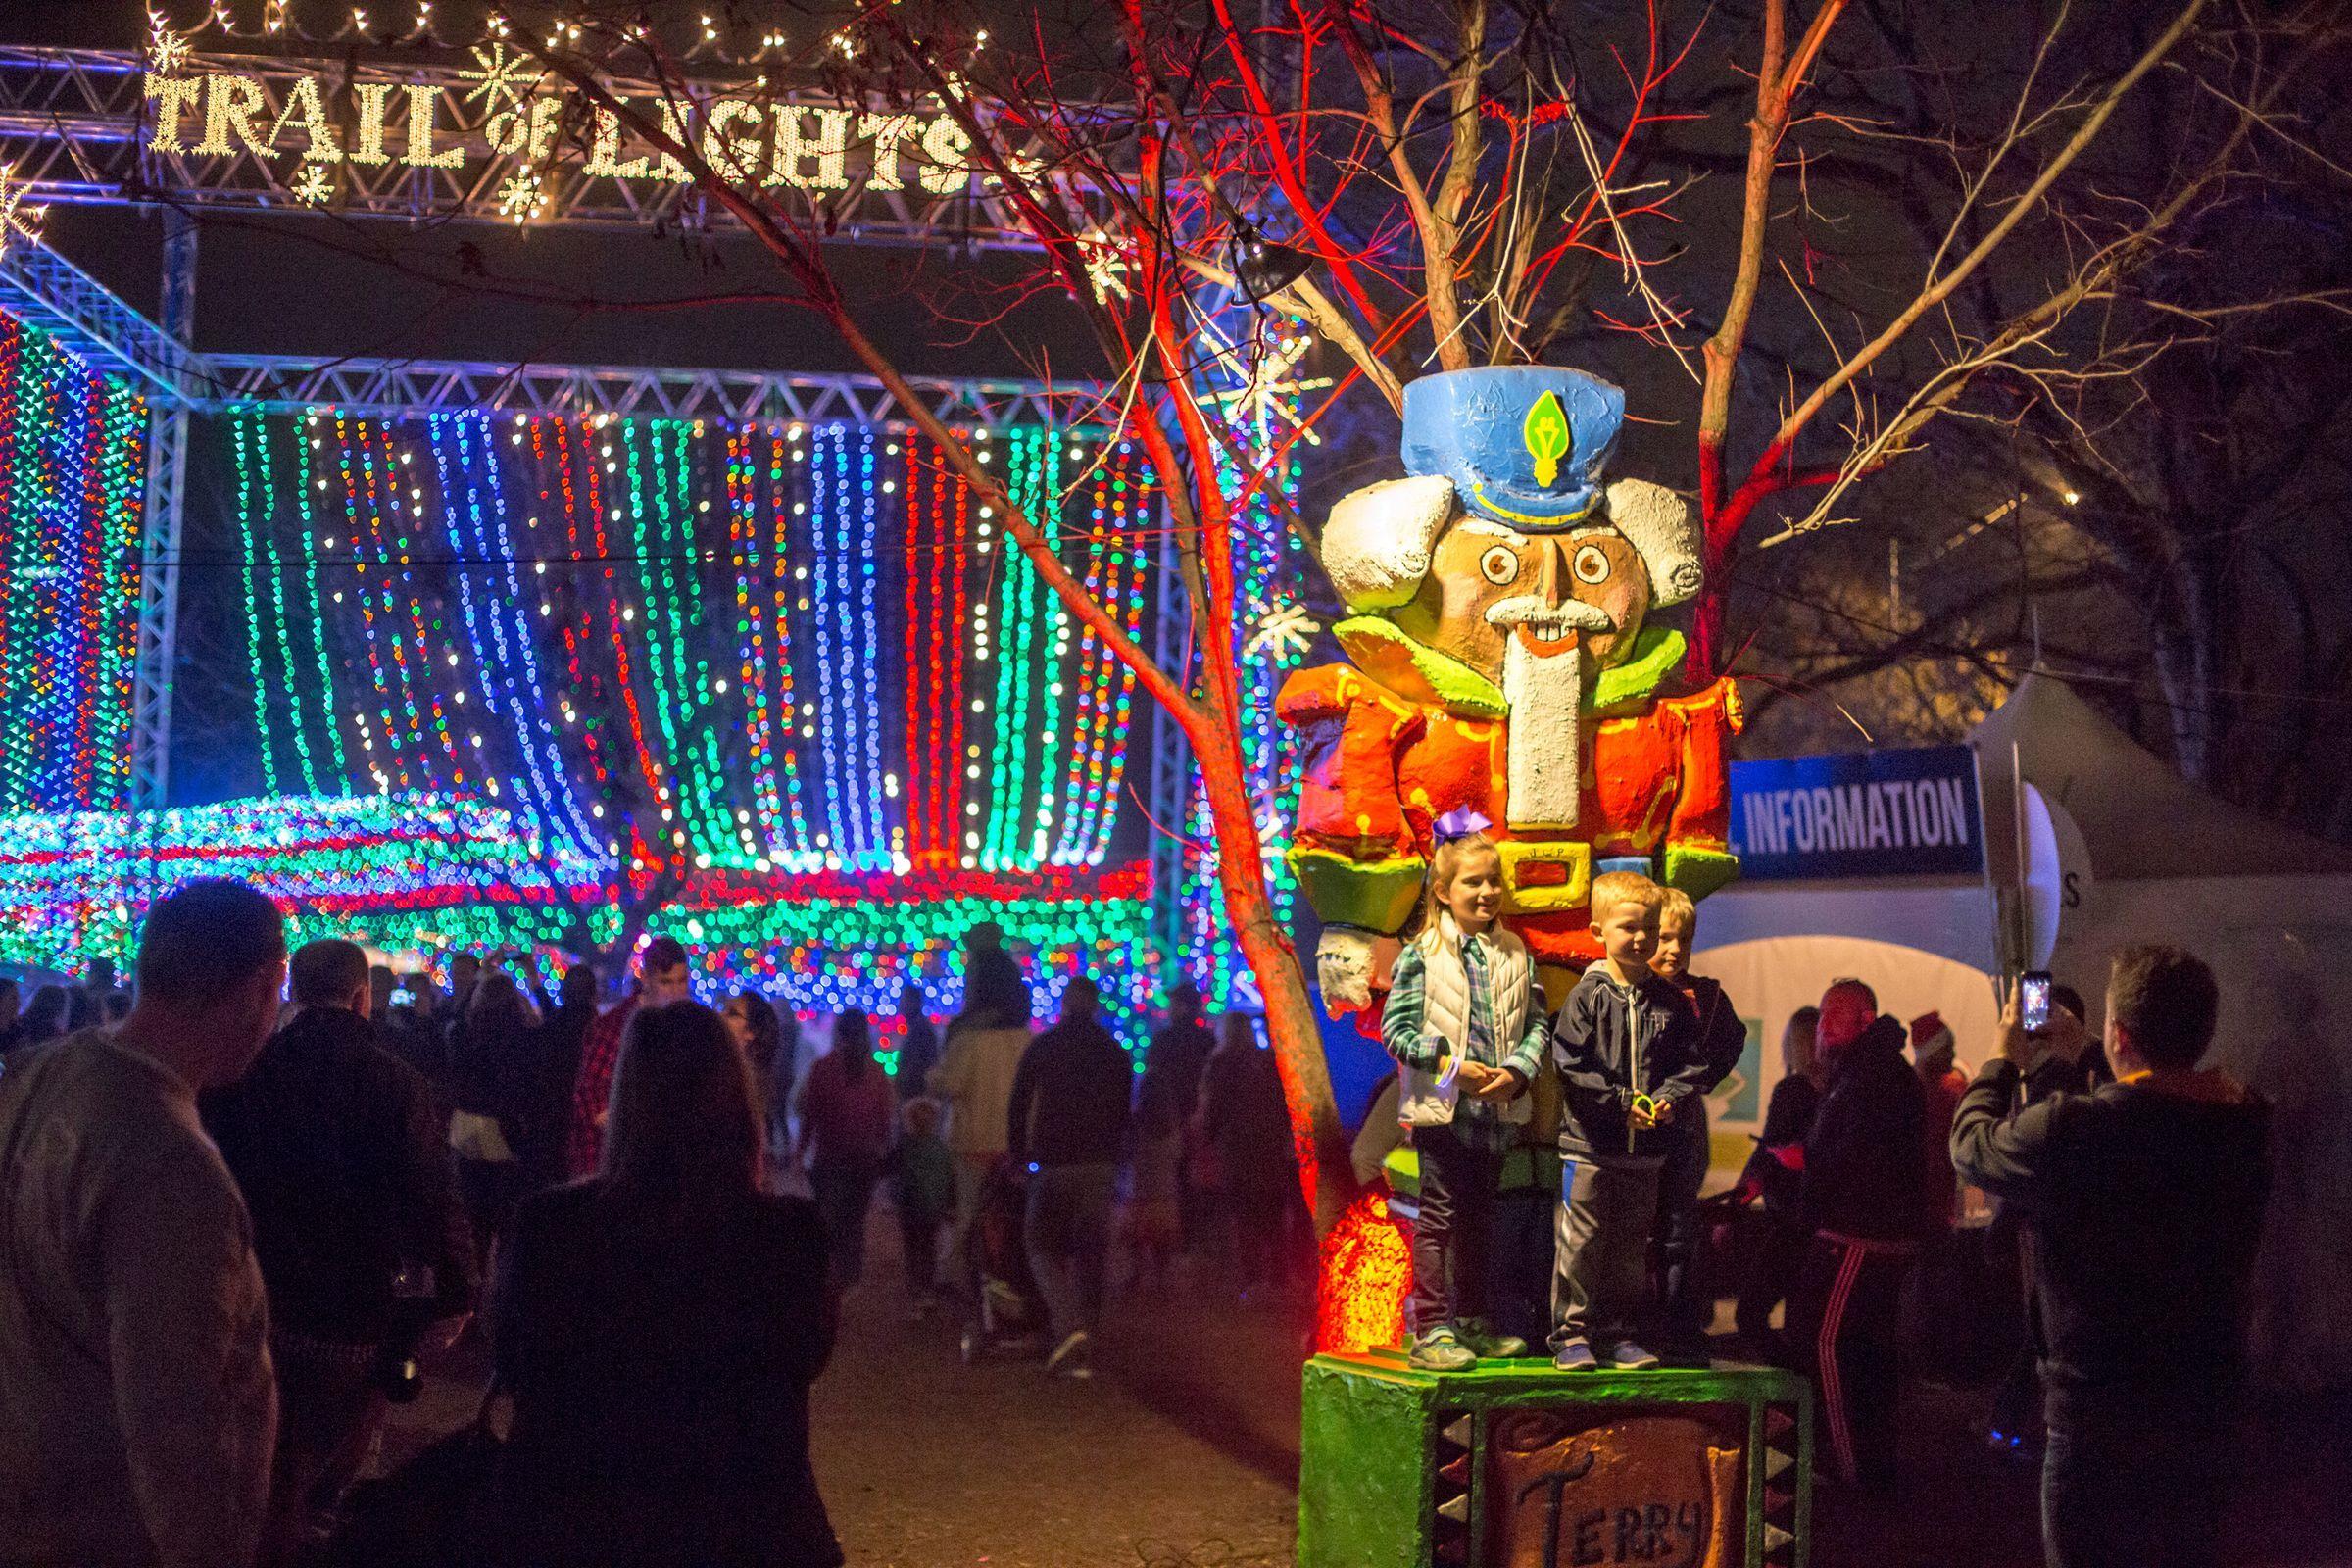 Austin Trail of Lights Best christmas lights, Best